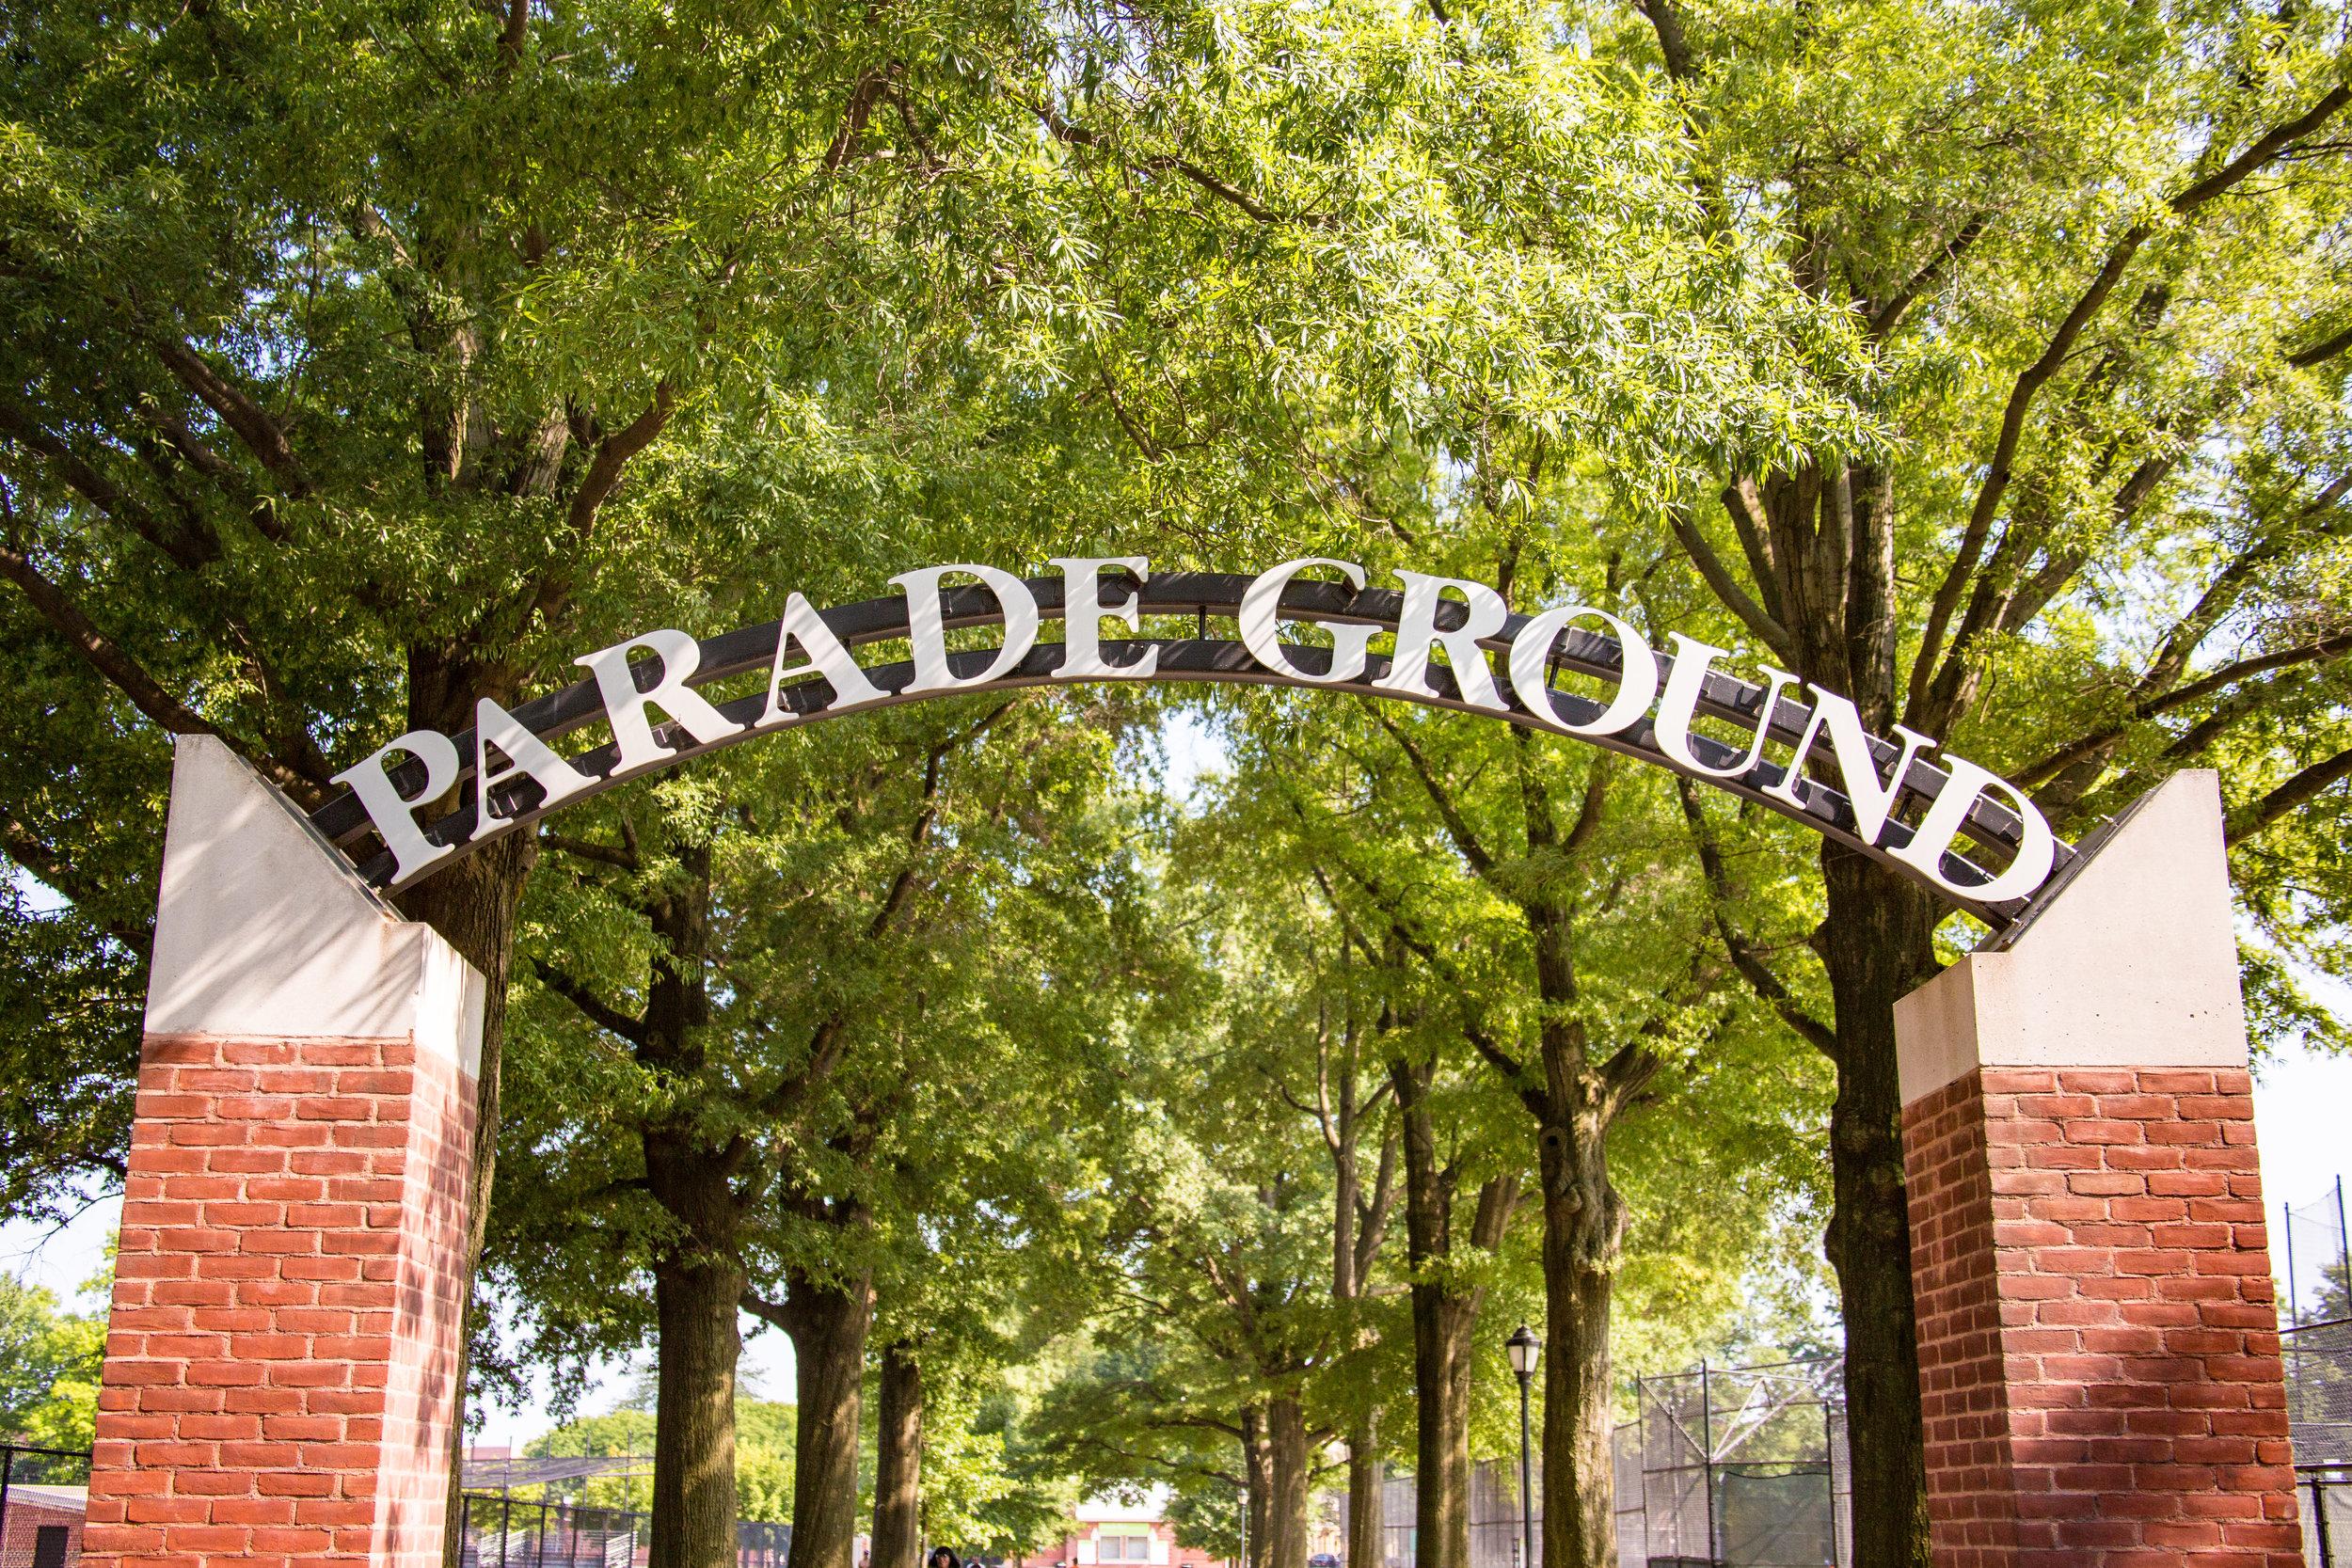 LSNY_Parade_Grounds-15.jpg